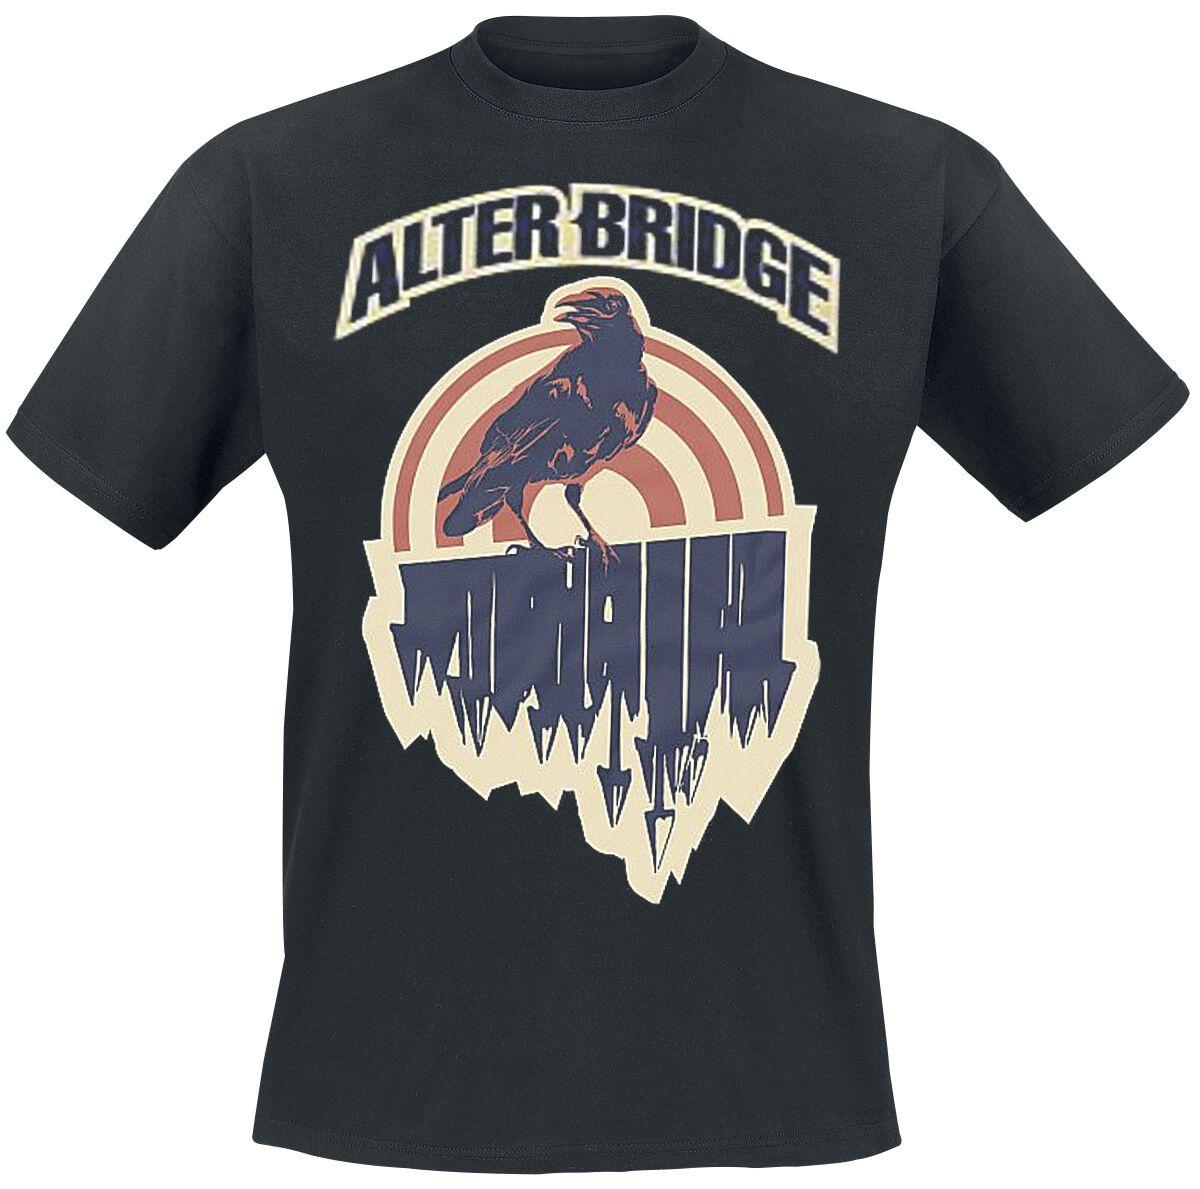 Zespoły - Koszulki - T-Shirt Alter Bridge Black Crow T-Shirt czarny - 357055